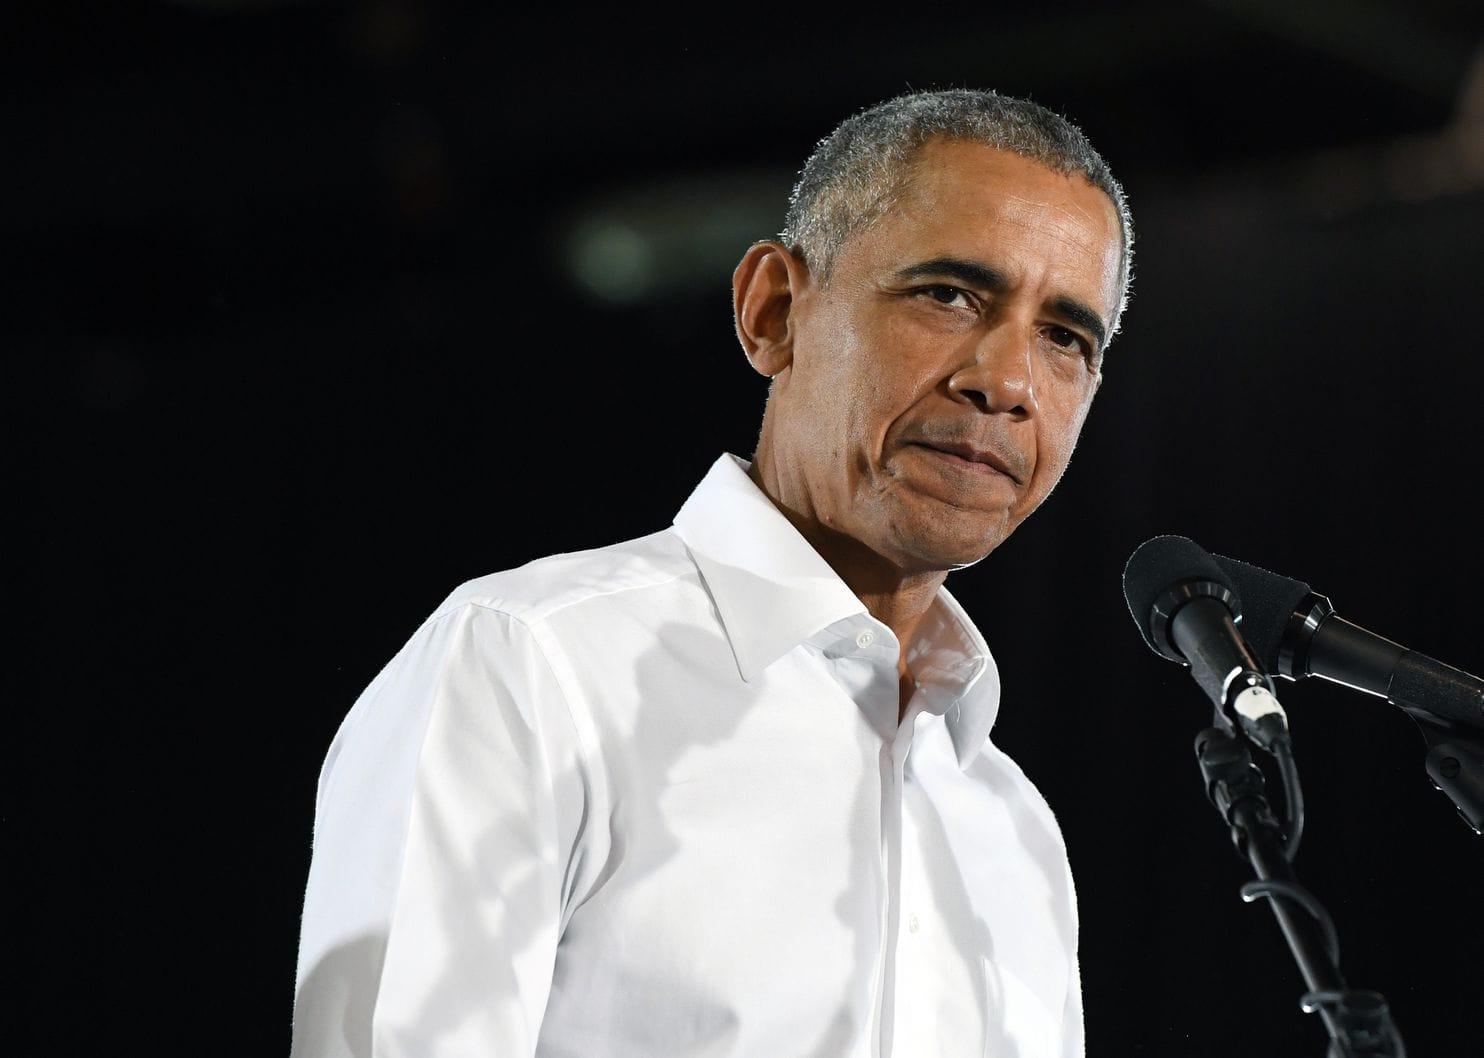 Mantan Presiden Amerika Serikat Barrack Obama. (Foto: washingtonpost.com)